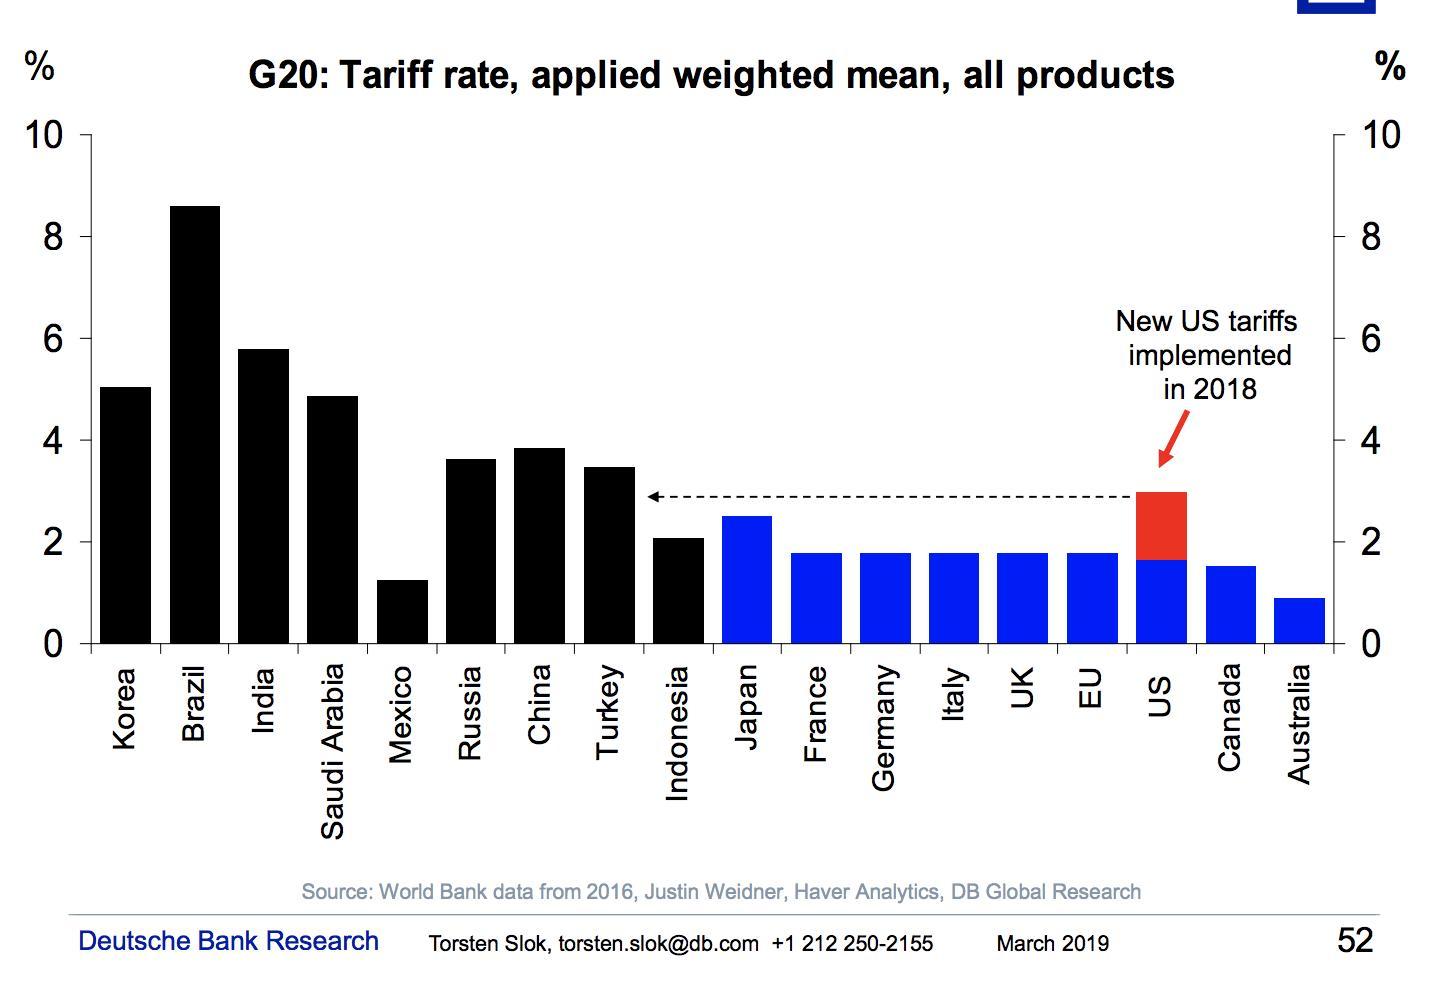 America's new tariffs in 2018…